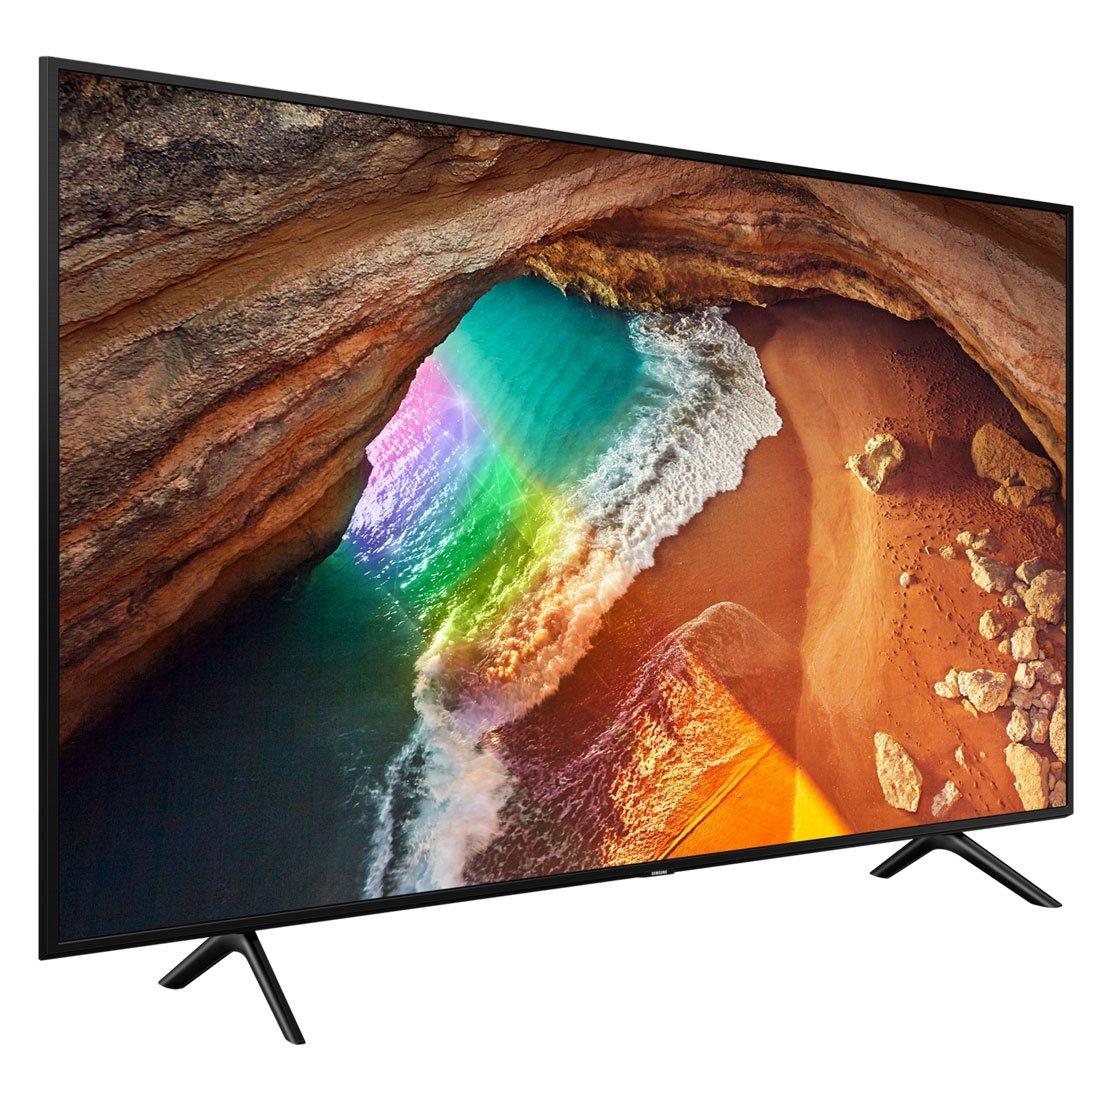 "Samsung QN65Q60RAFXZC 65"" QLED 4K Smart Flat Screen TV"